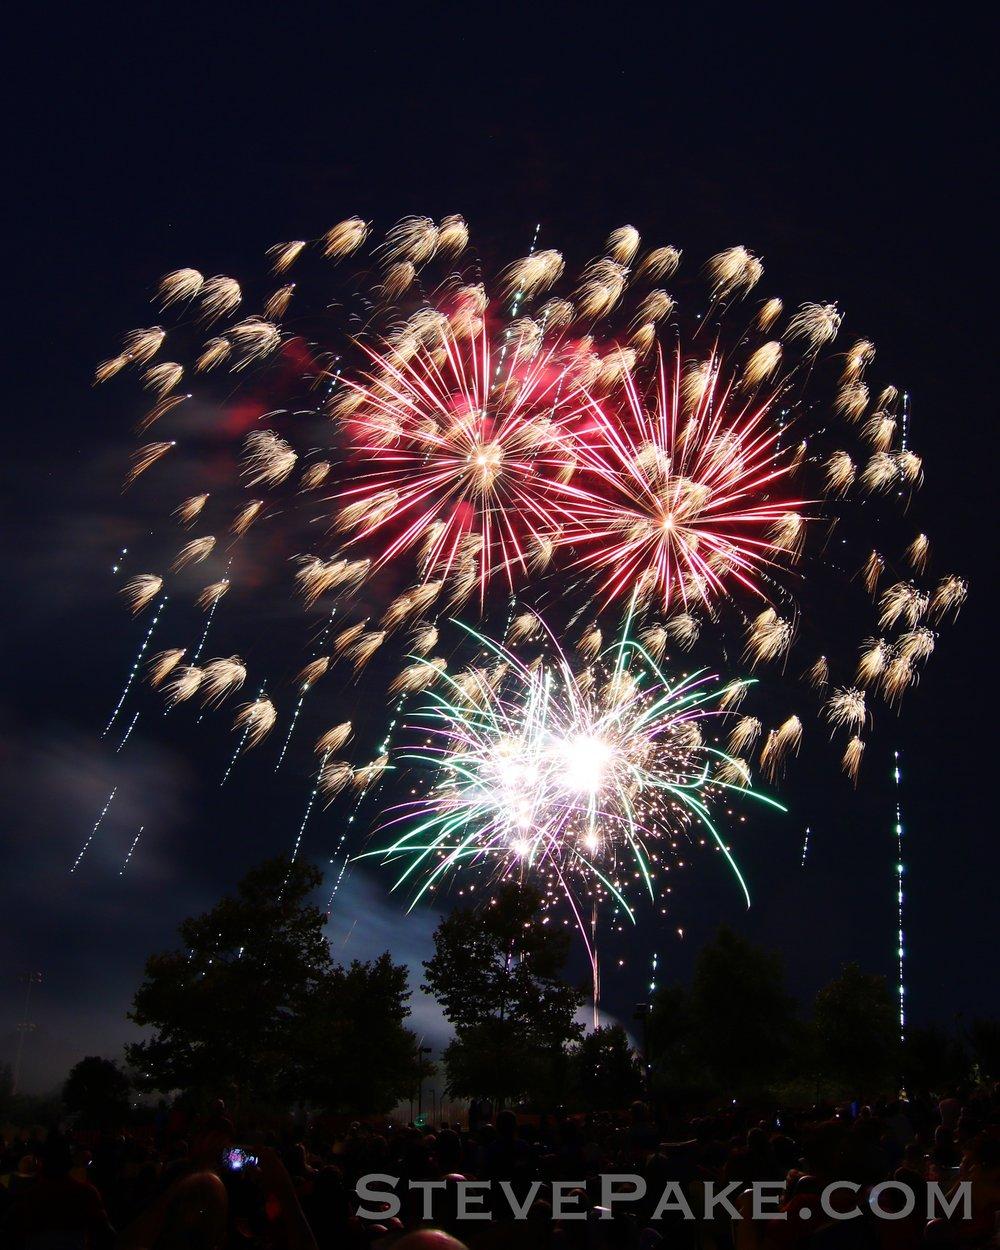 Fireworks2018_43_GE3A8586ap-HD-WM.jpg